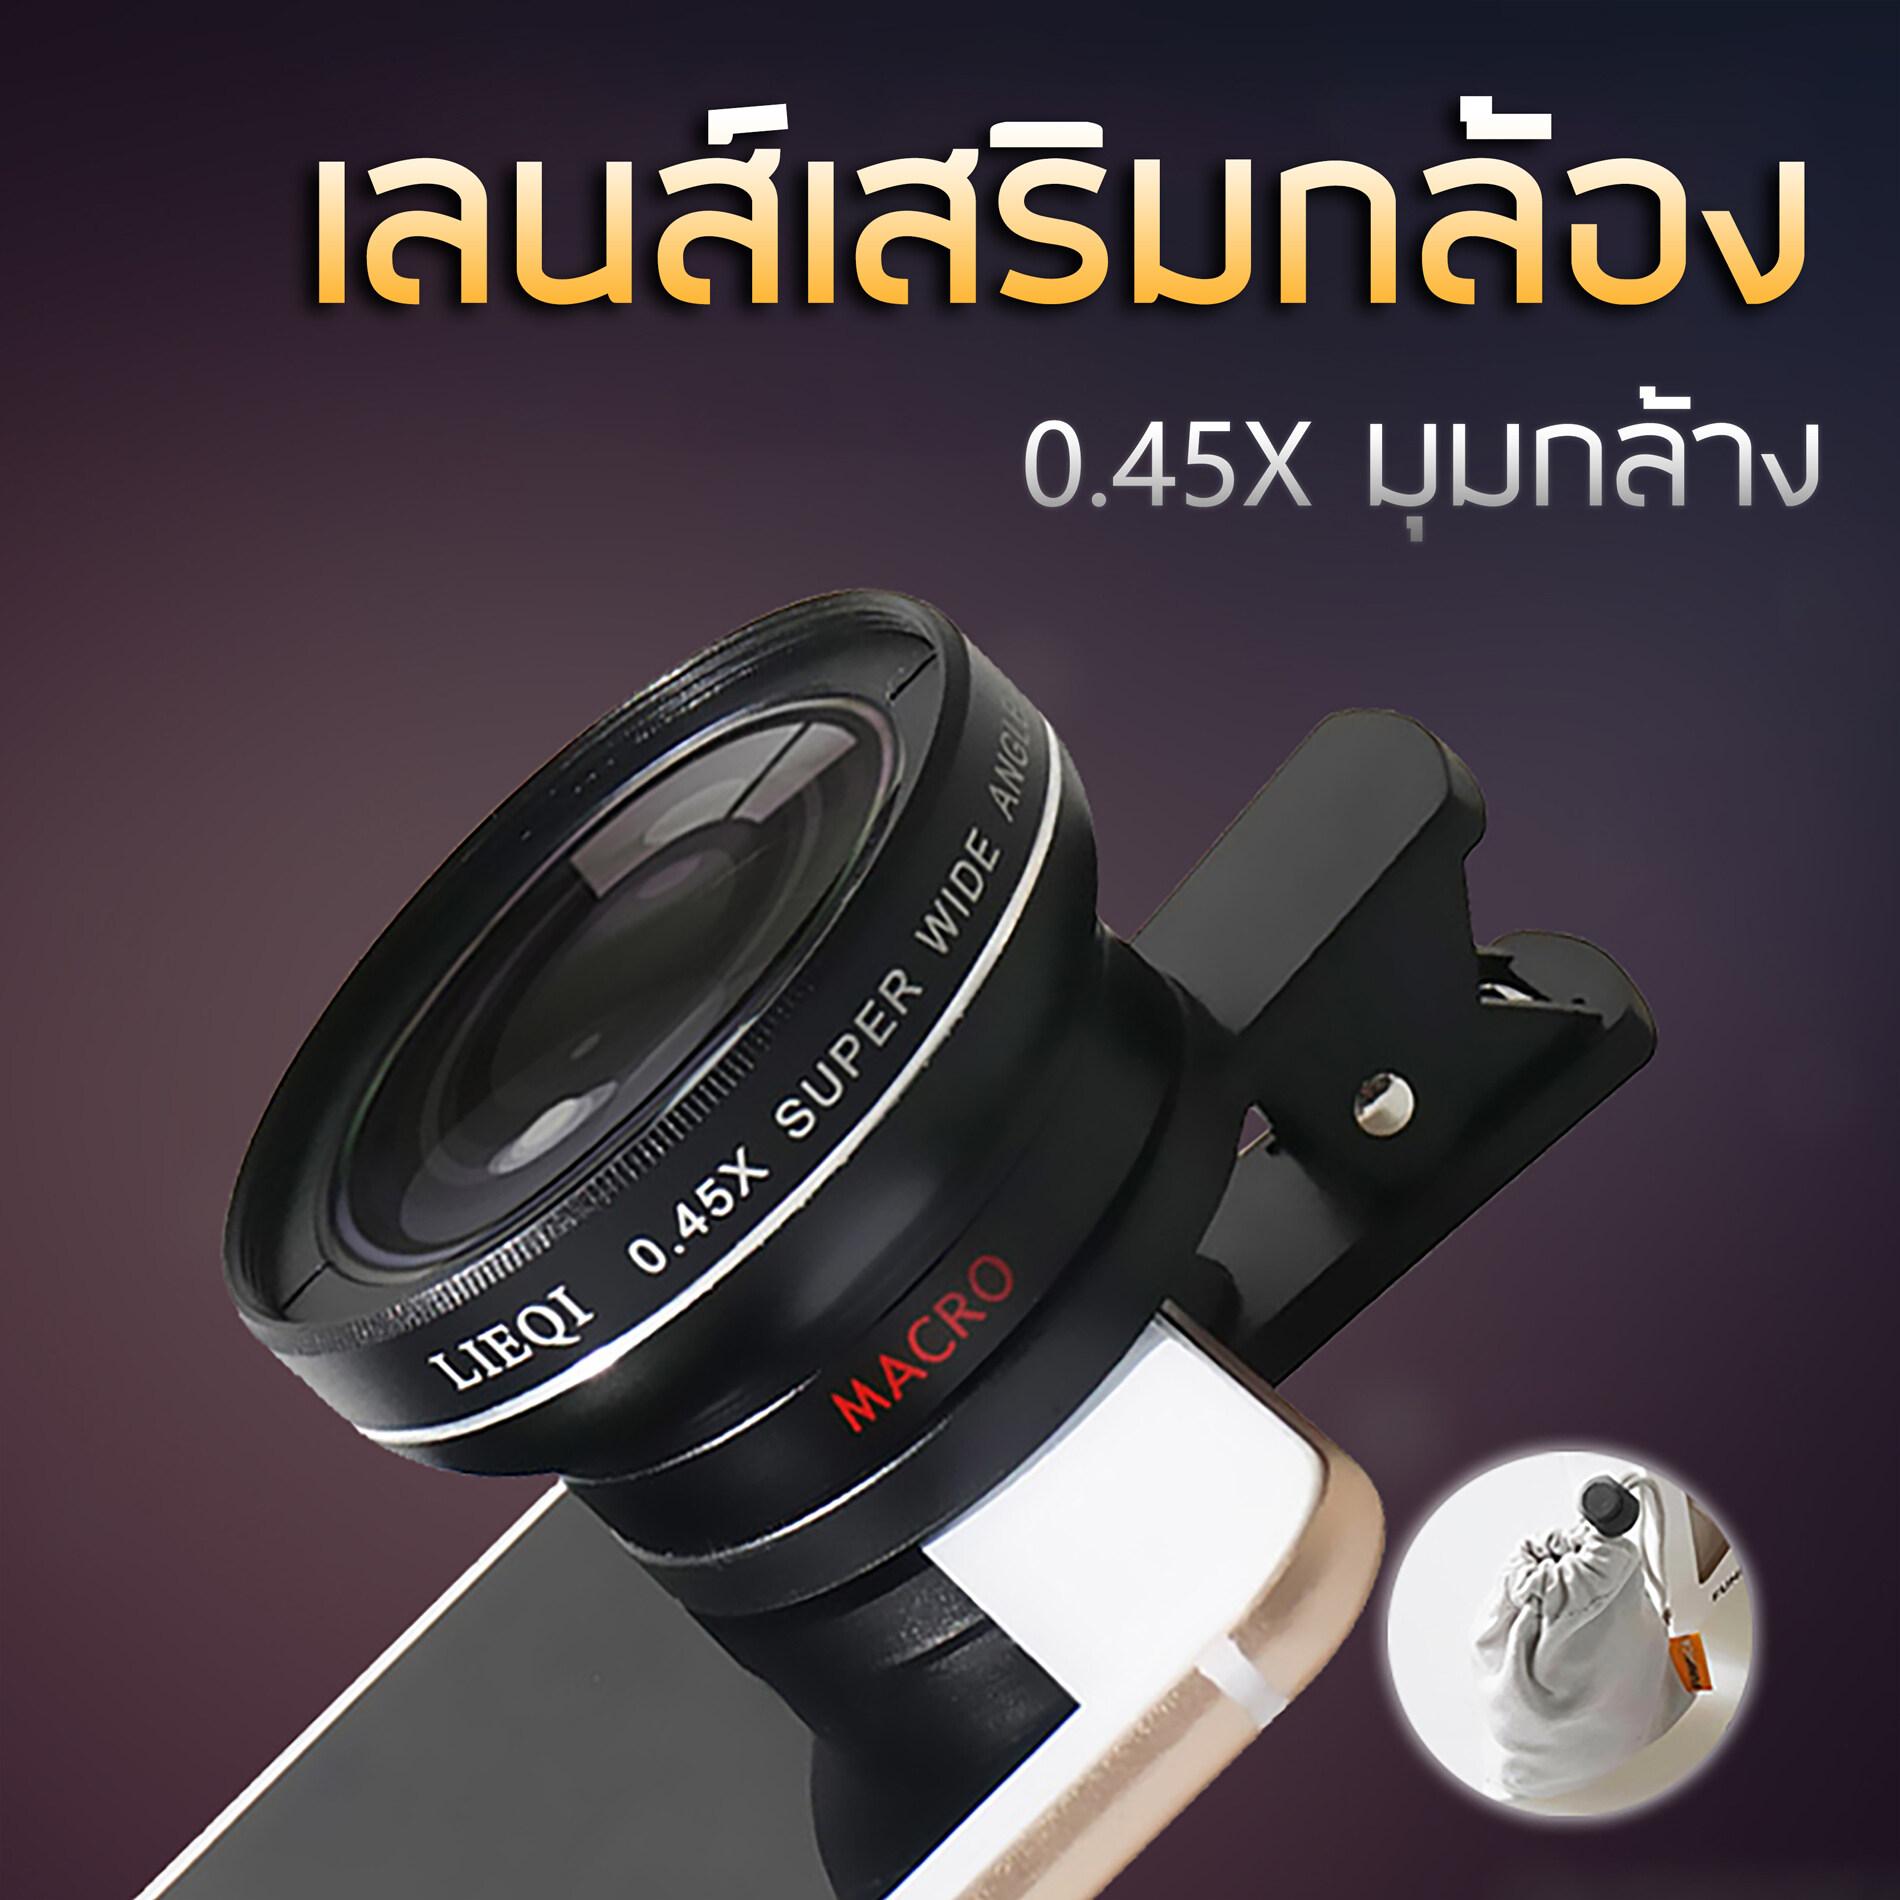 Lieqi Lens เลนส์เสริมโทรศัพท์ เลนส์มือถือ 2in1 รุ่น Lq-027 (สีดำ Black).